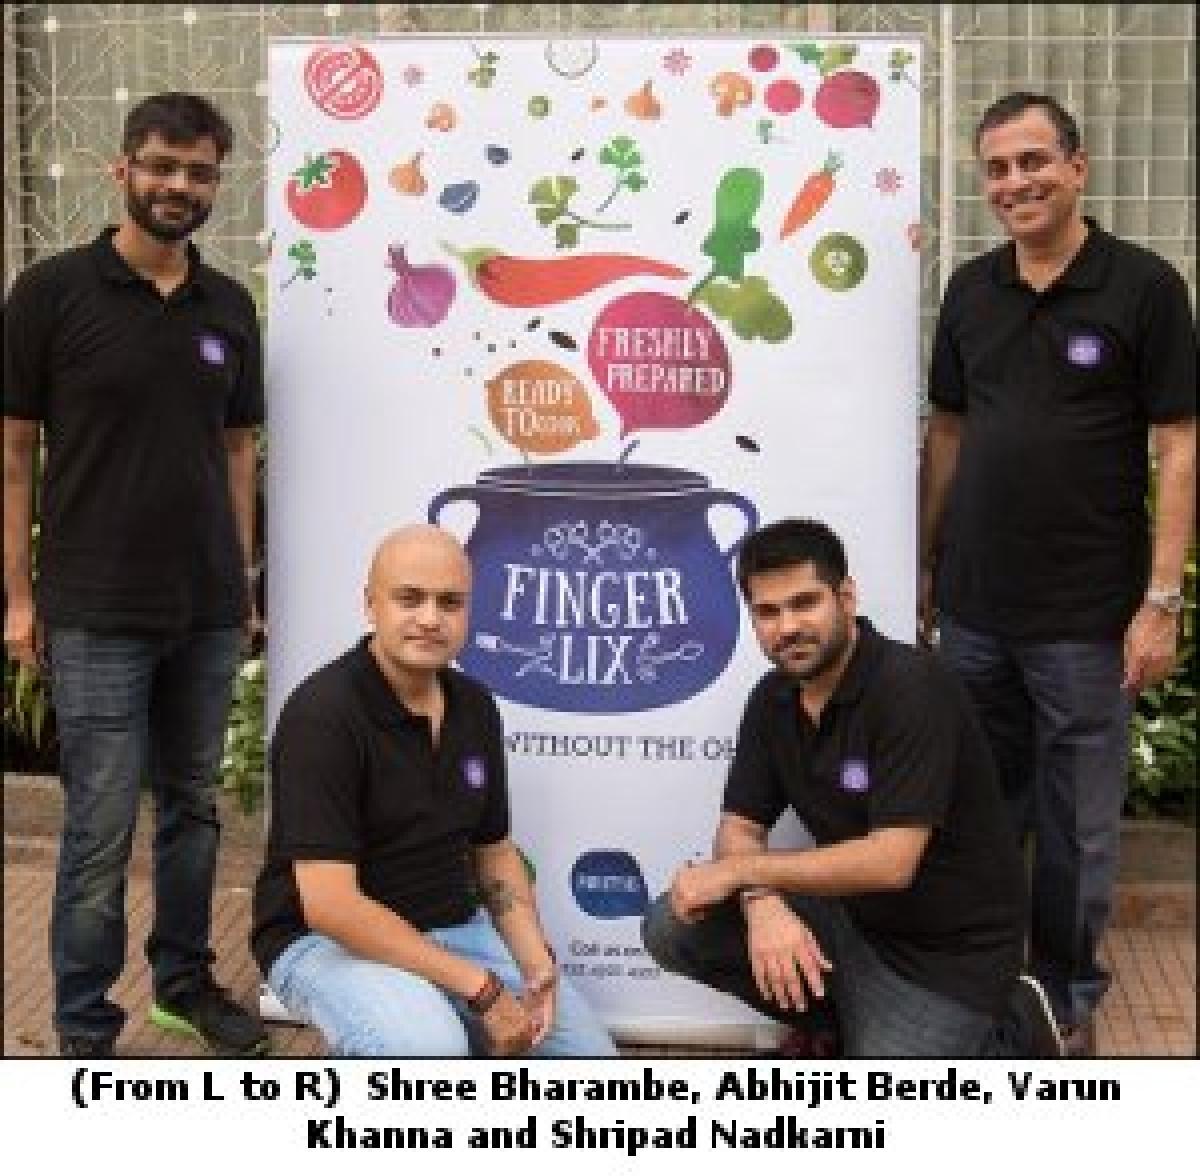 Shripad Nadkarni, Shree Bharambe, Varun Khanna, and Abhijit Berde launch Fingerlix, a food start-up